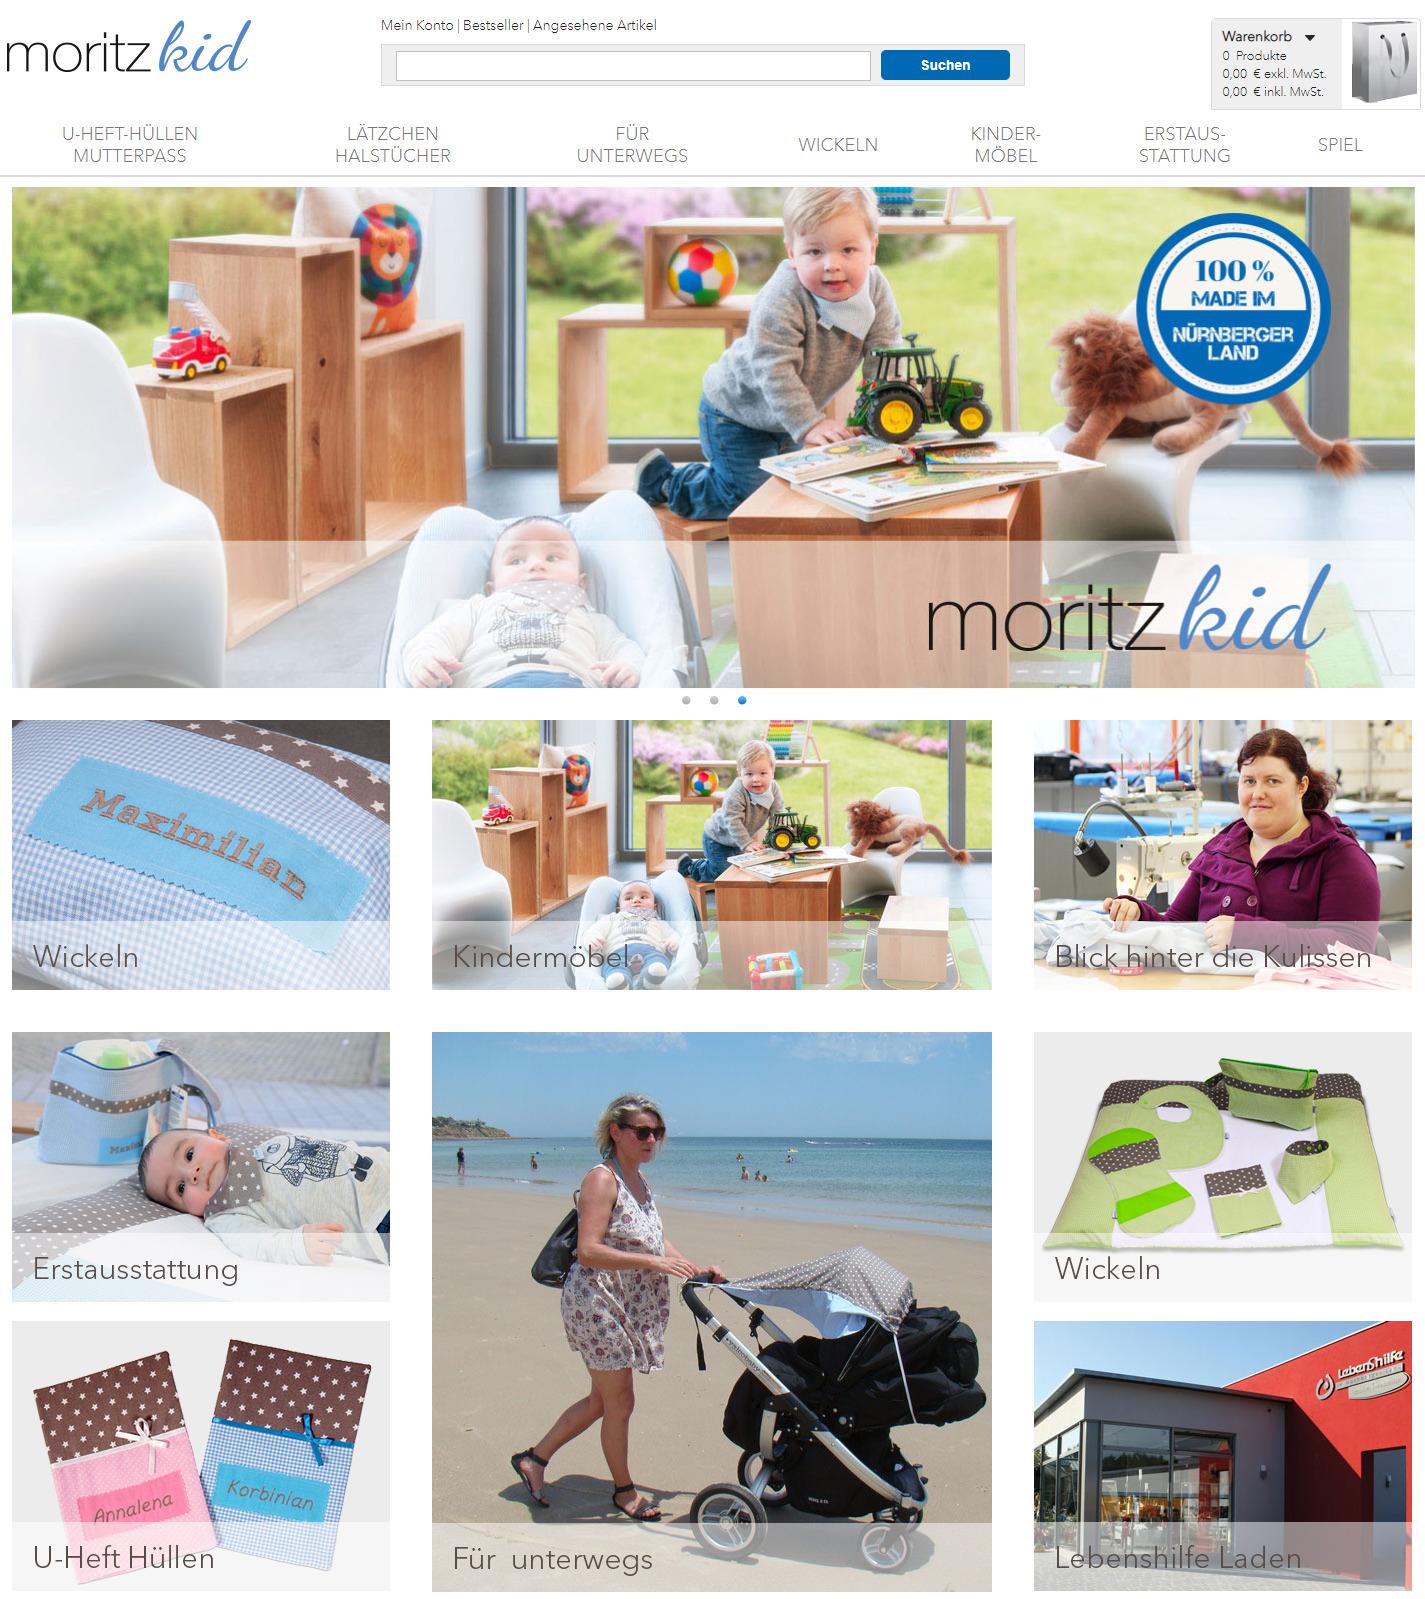 moritz kid referenz online shop